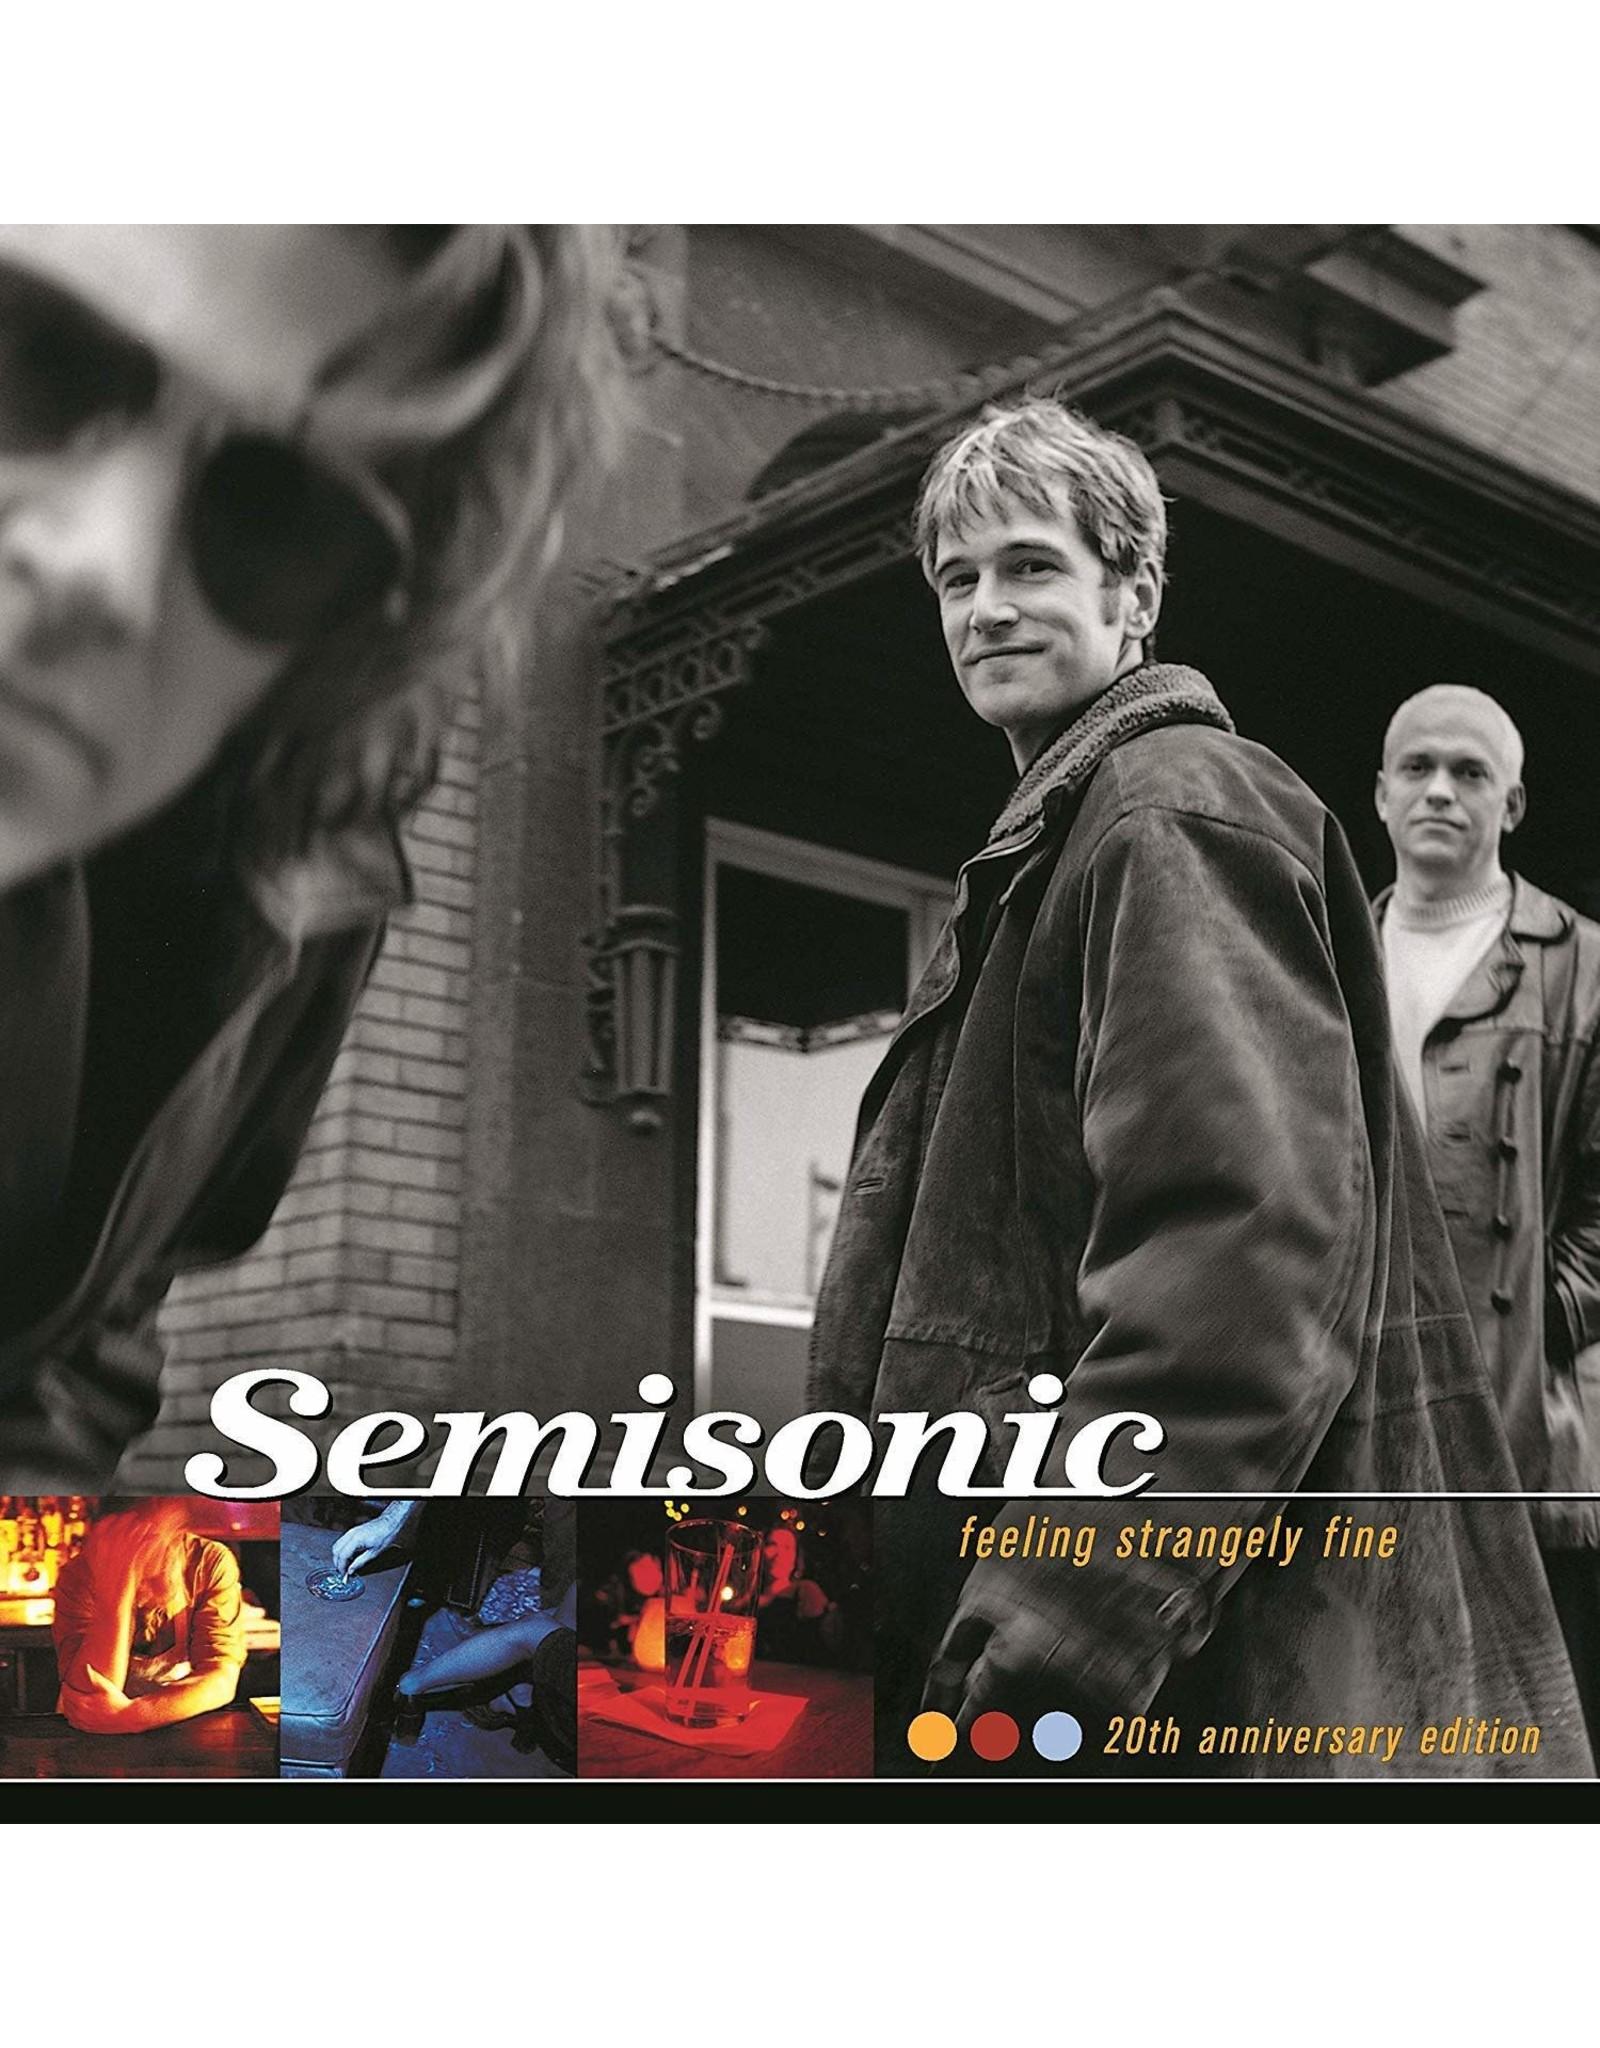 Semisonic - Felling Strangely Fine LP